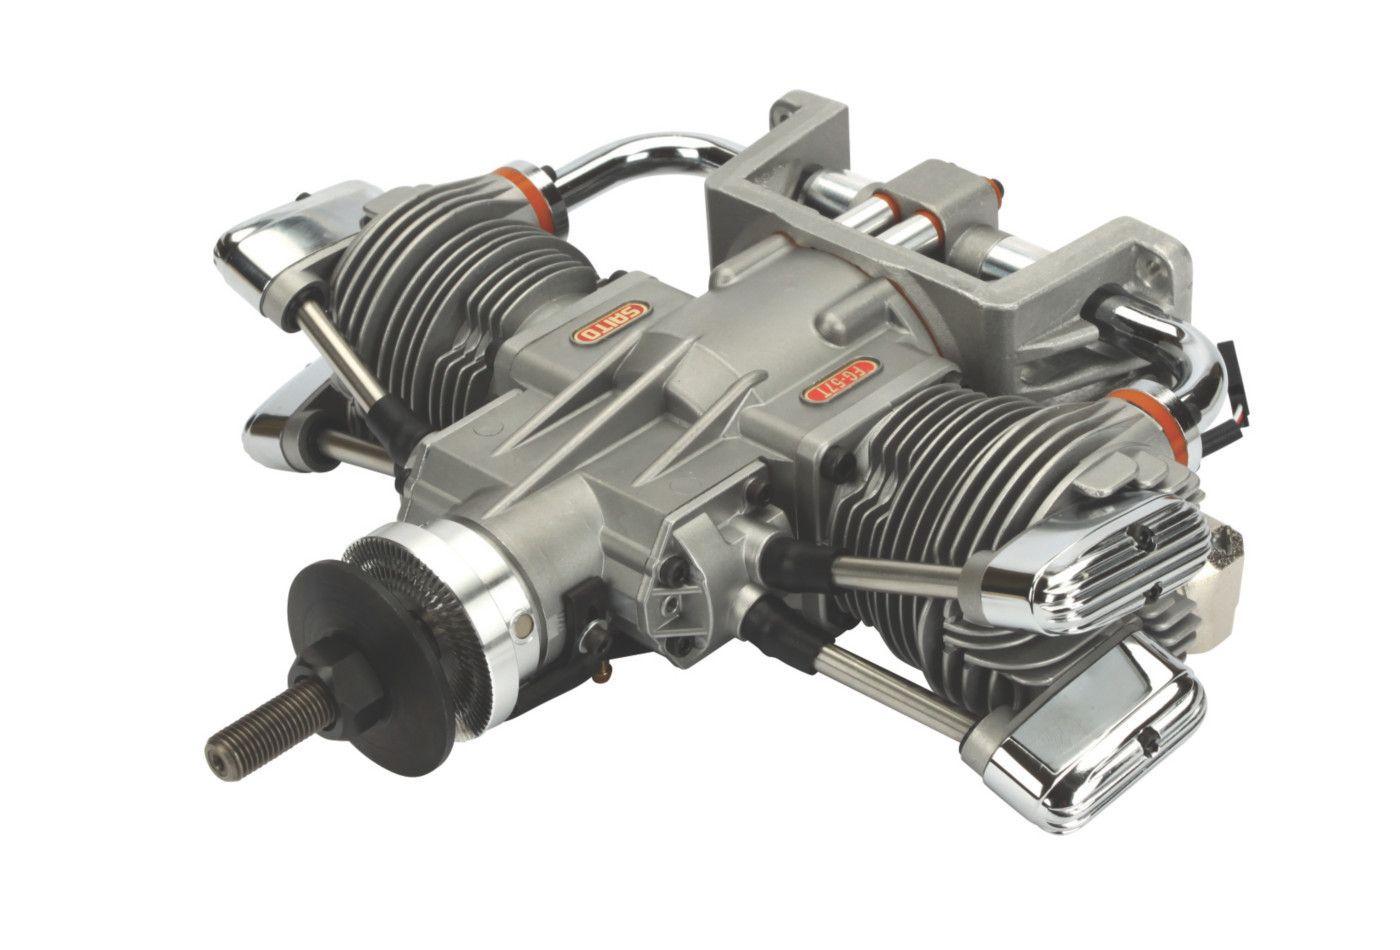 image for 57cc gas twin engine 4 stroke bg from horizonhobby [ 1400 x 778 Pixel ]